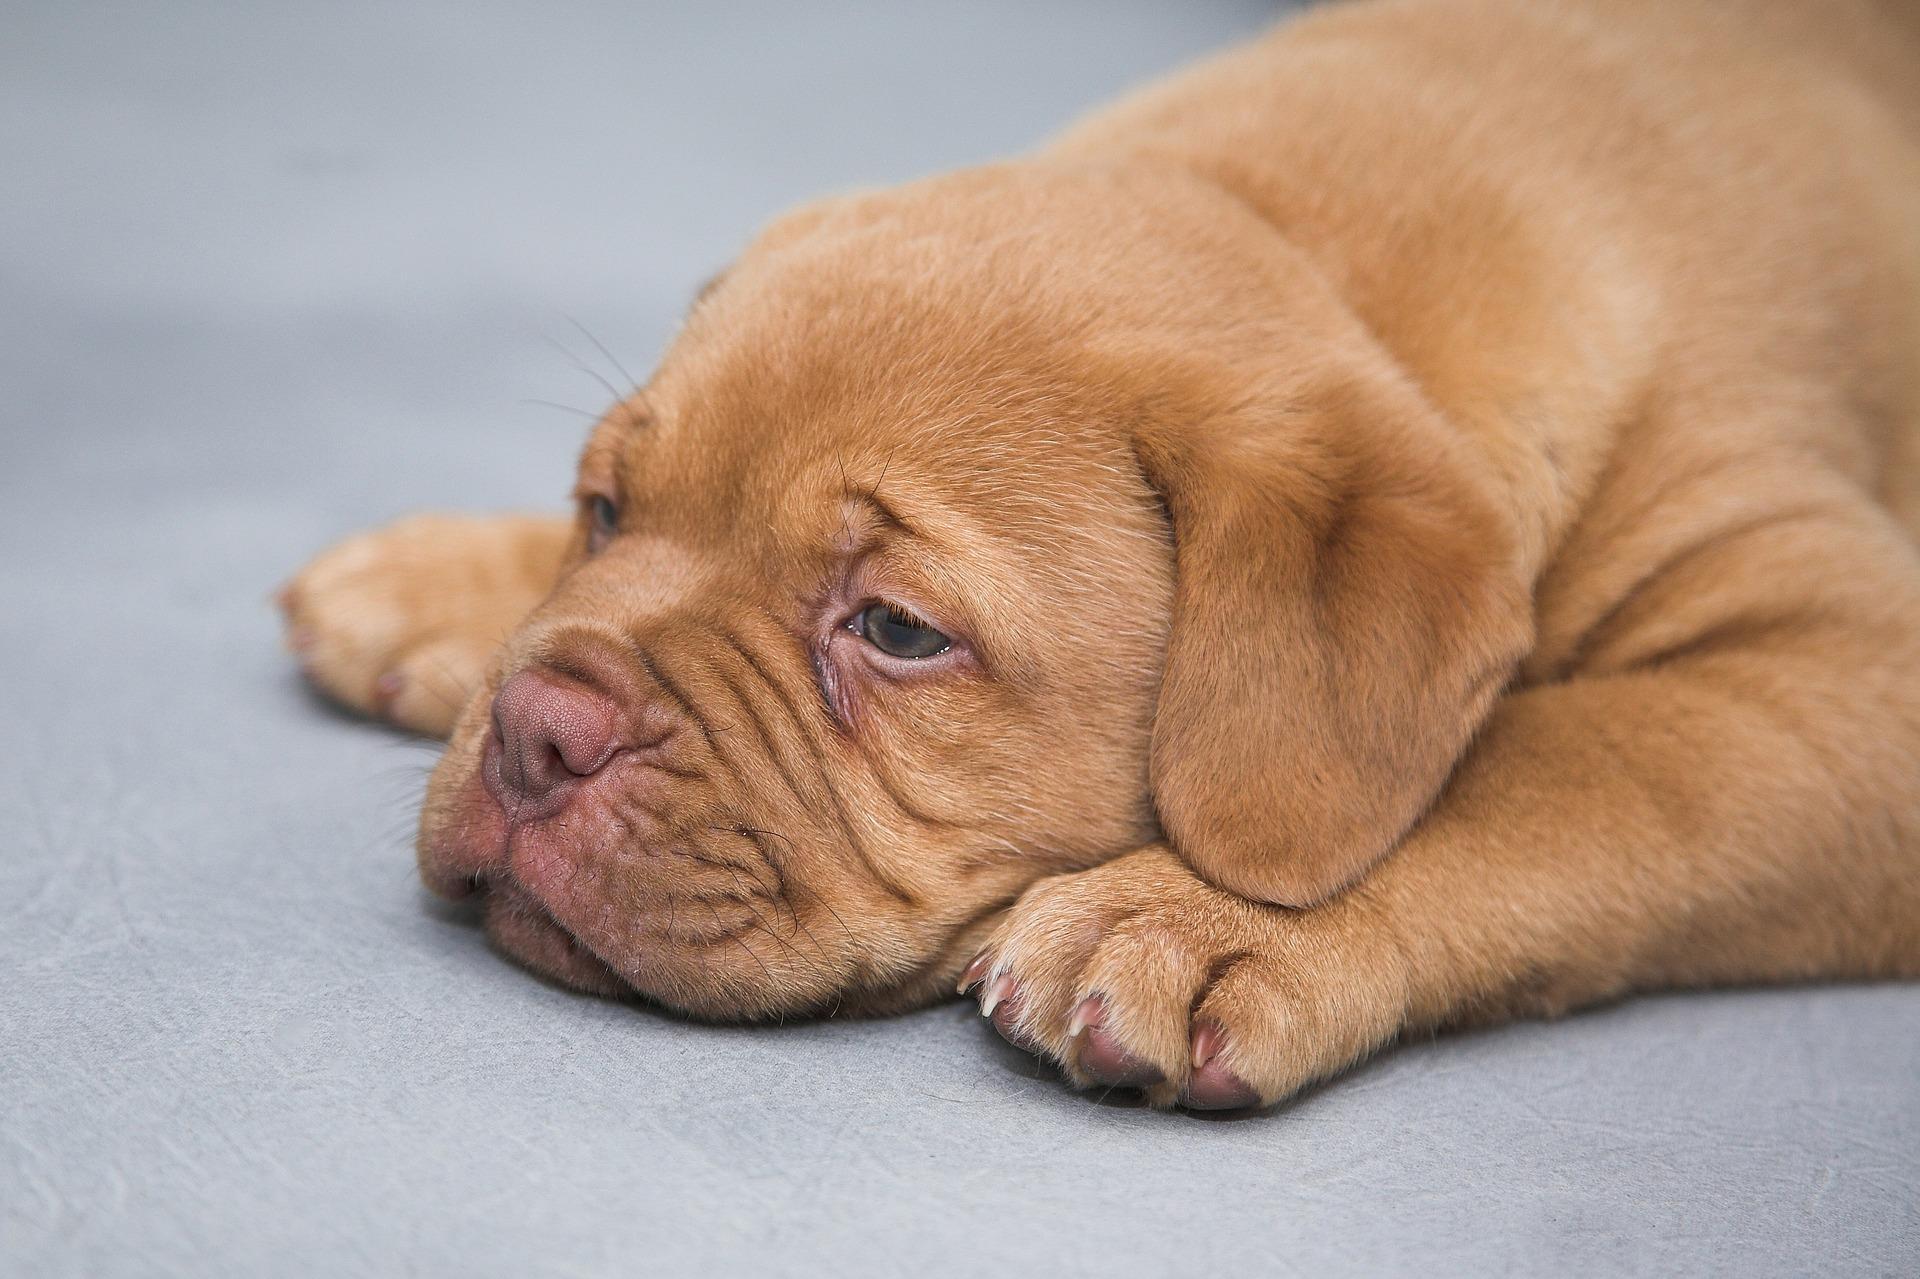 Qu hacer si a mi perro le da un ataque epil ptico for Como saber si me afecta clausula suelo